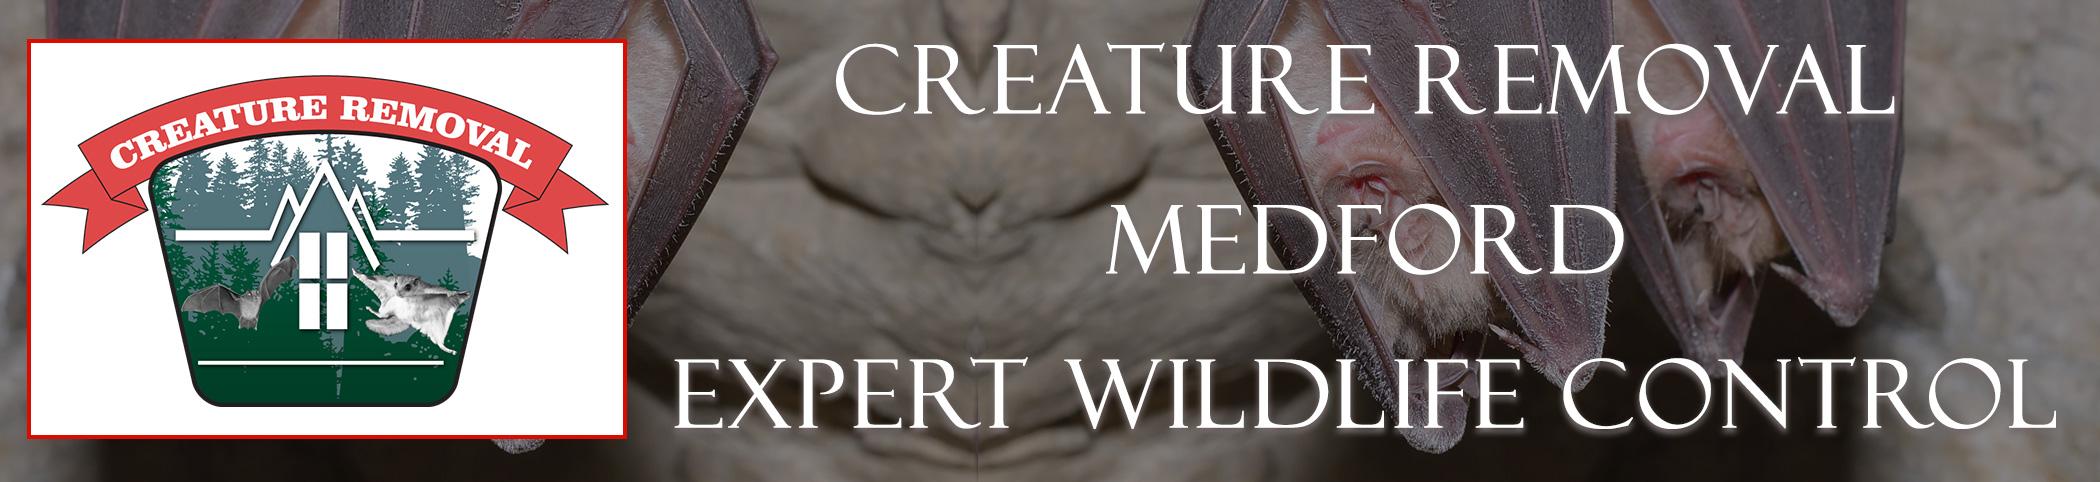 medford-mass-creature-removal-header